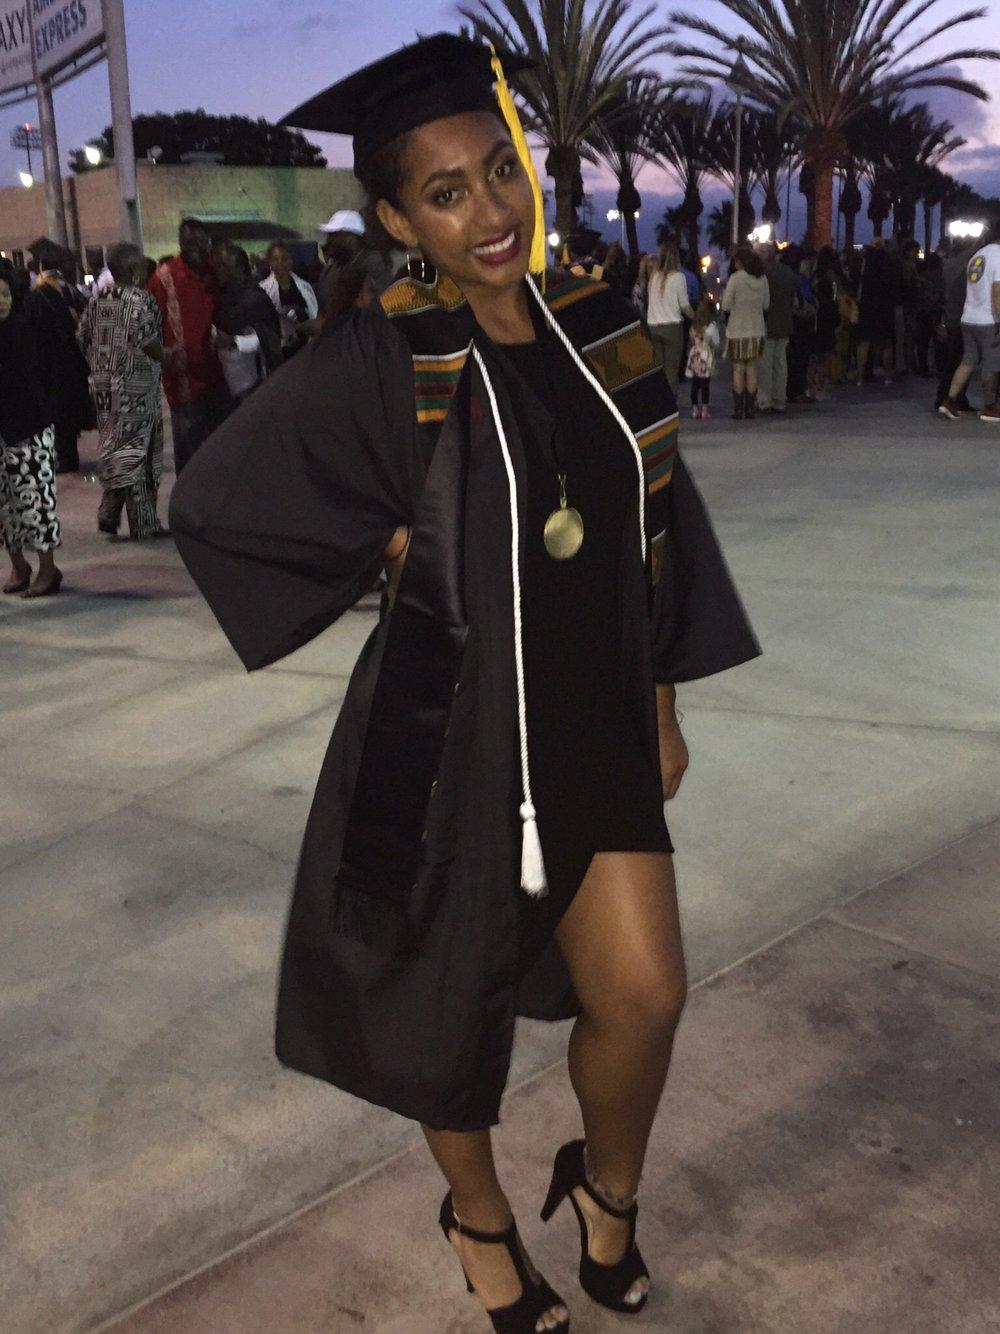 Post-Bacc graduation!